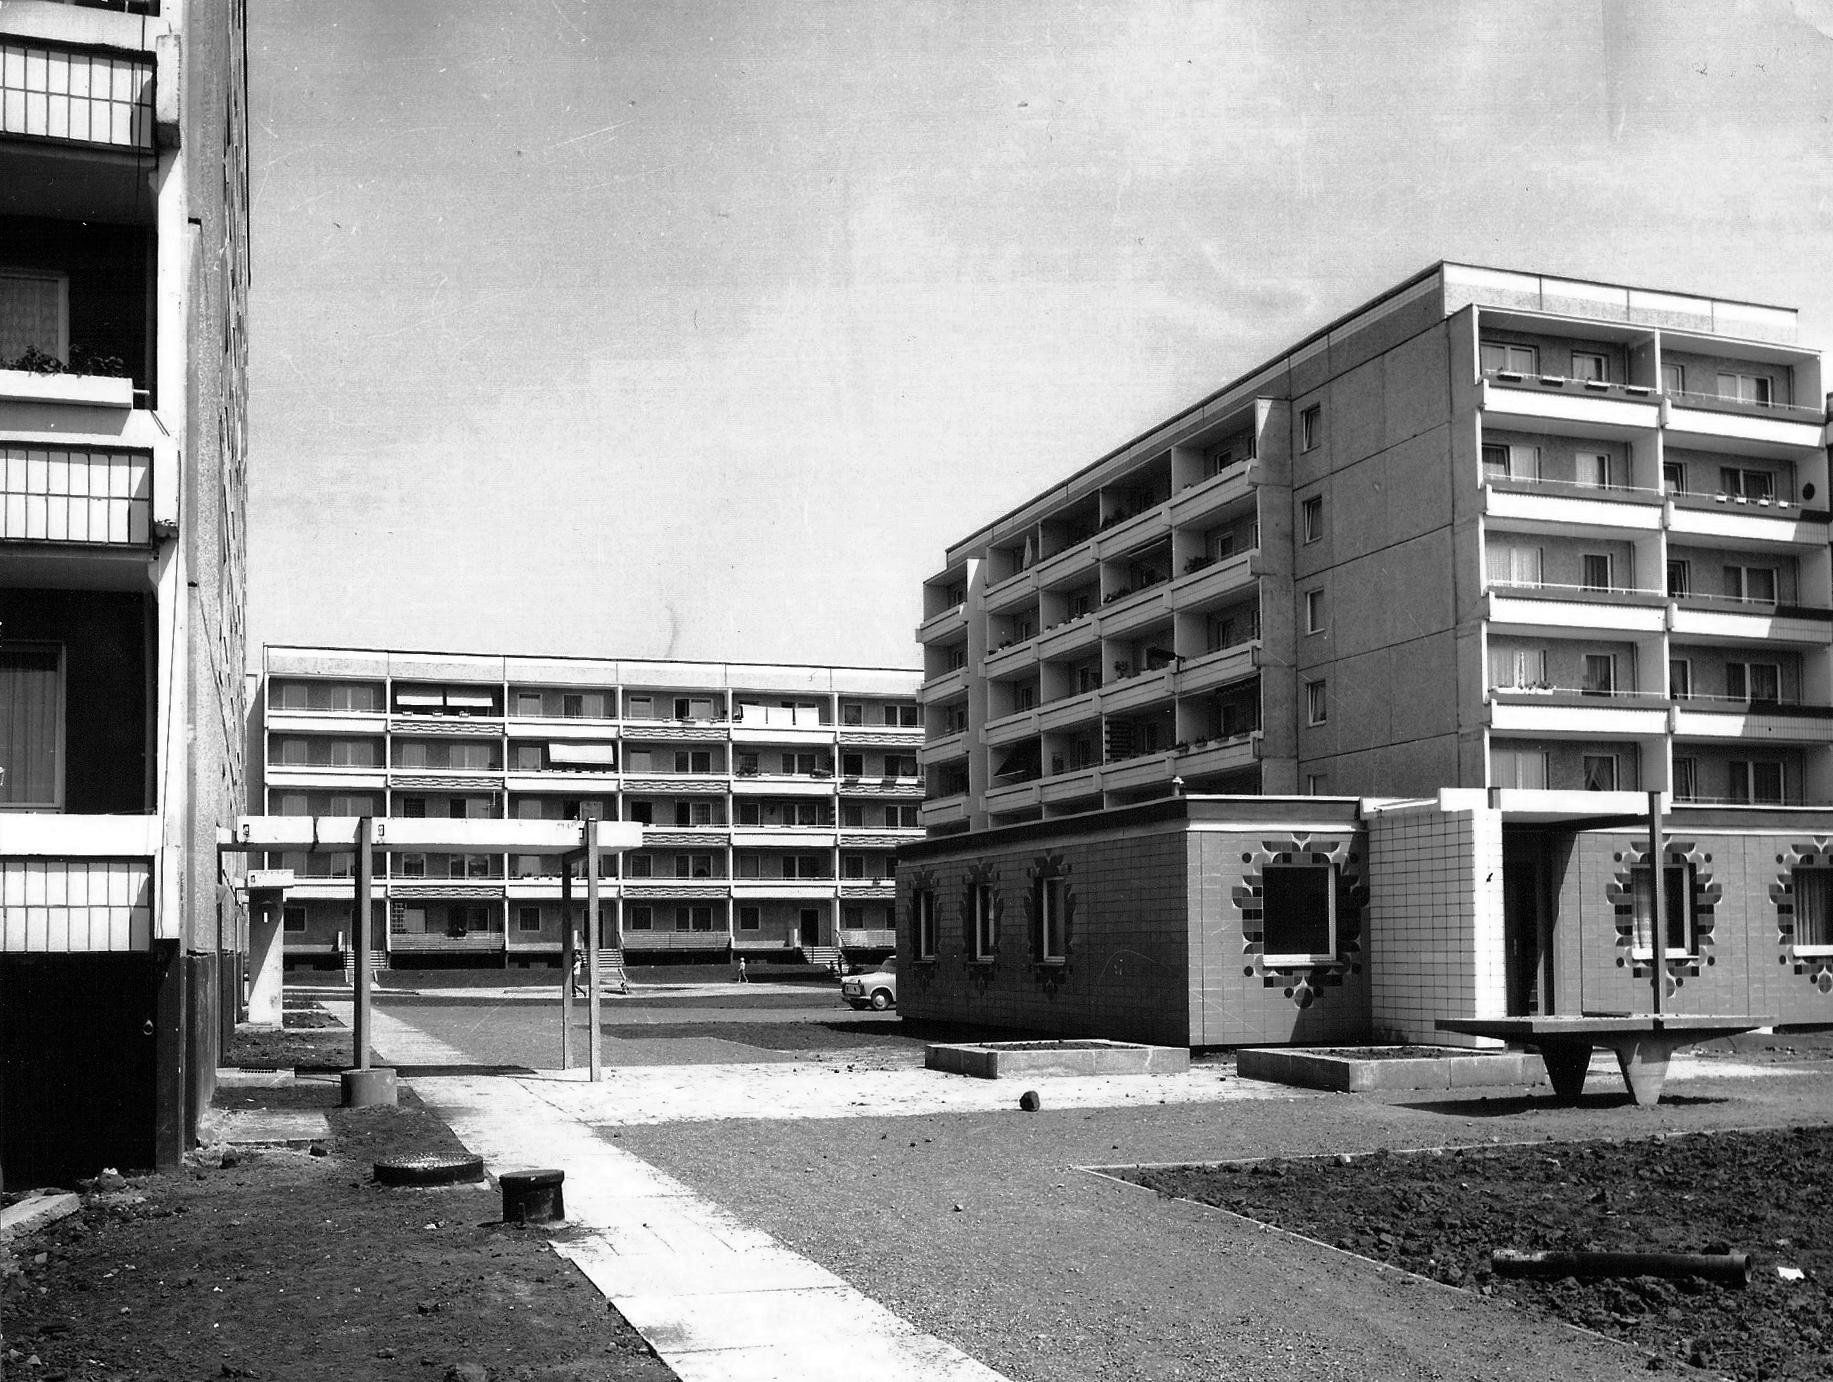 Plattenbau blocks in Neu Olvenstedt, Magdeburg Source: buergerinitiative olvenstedt